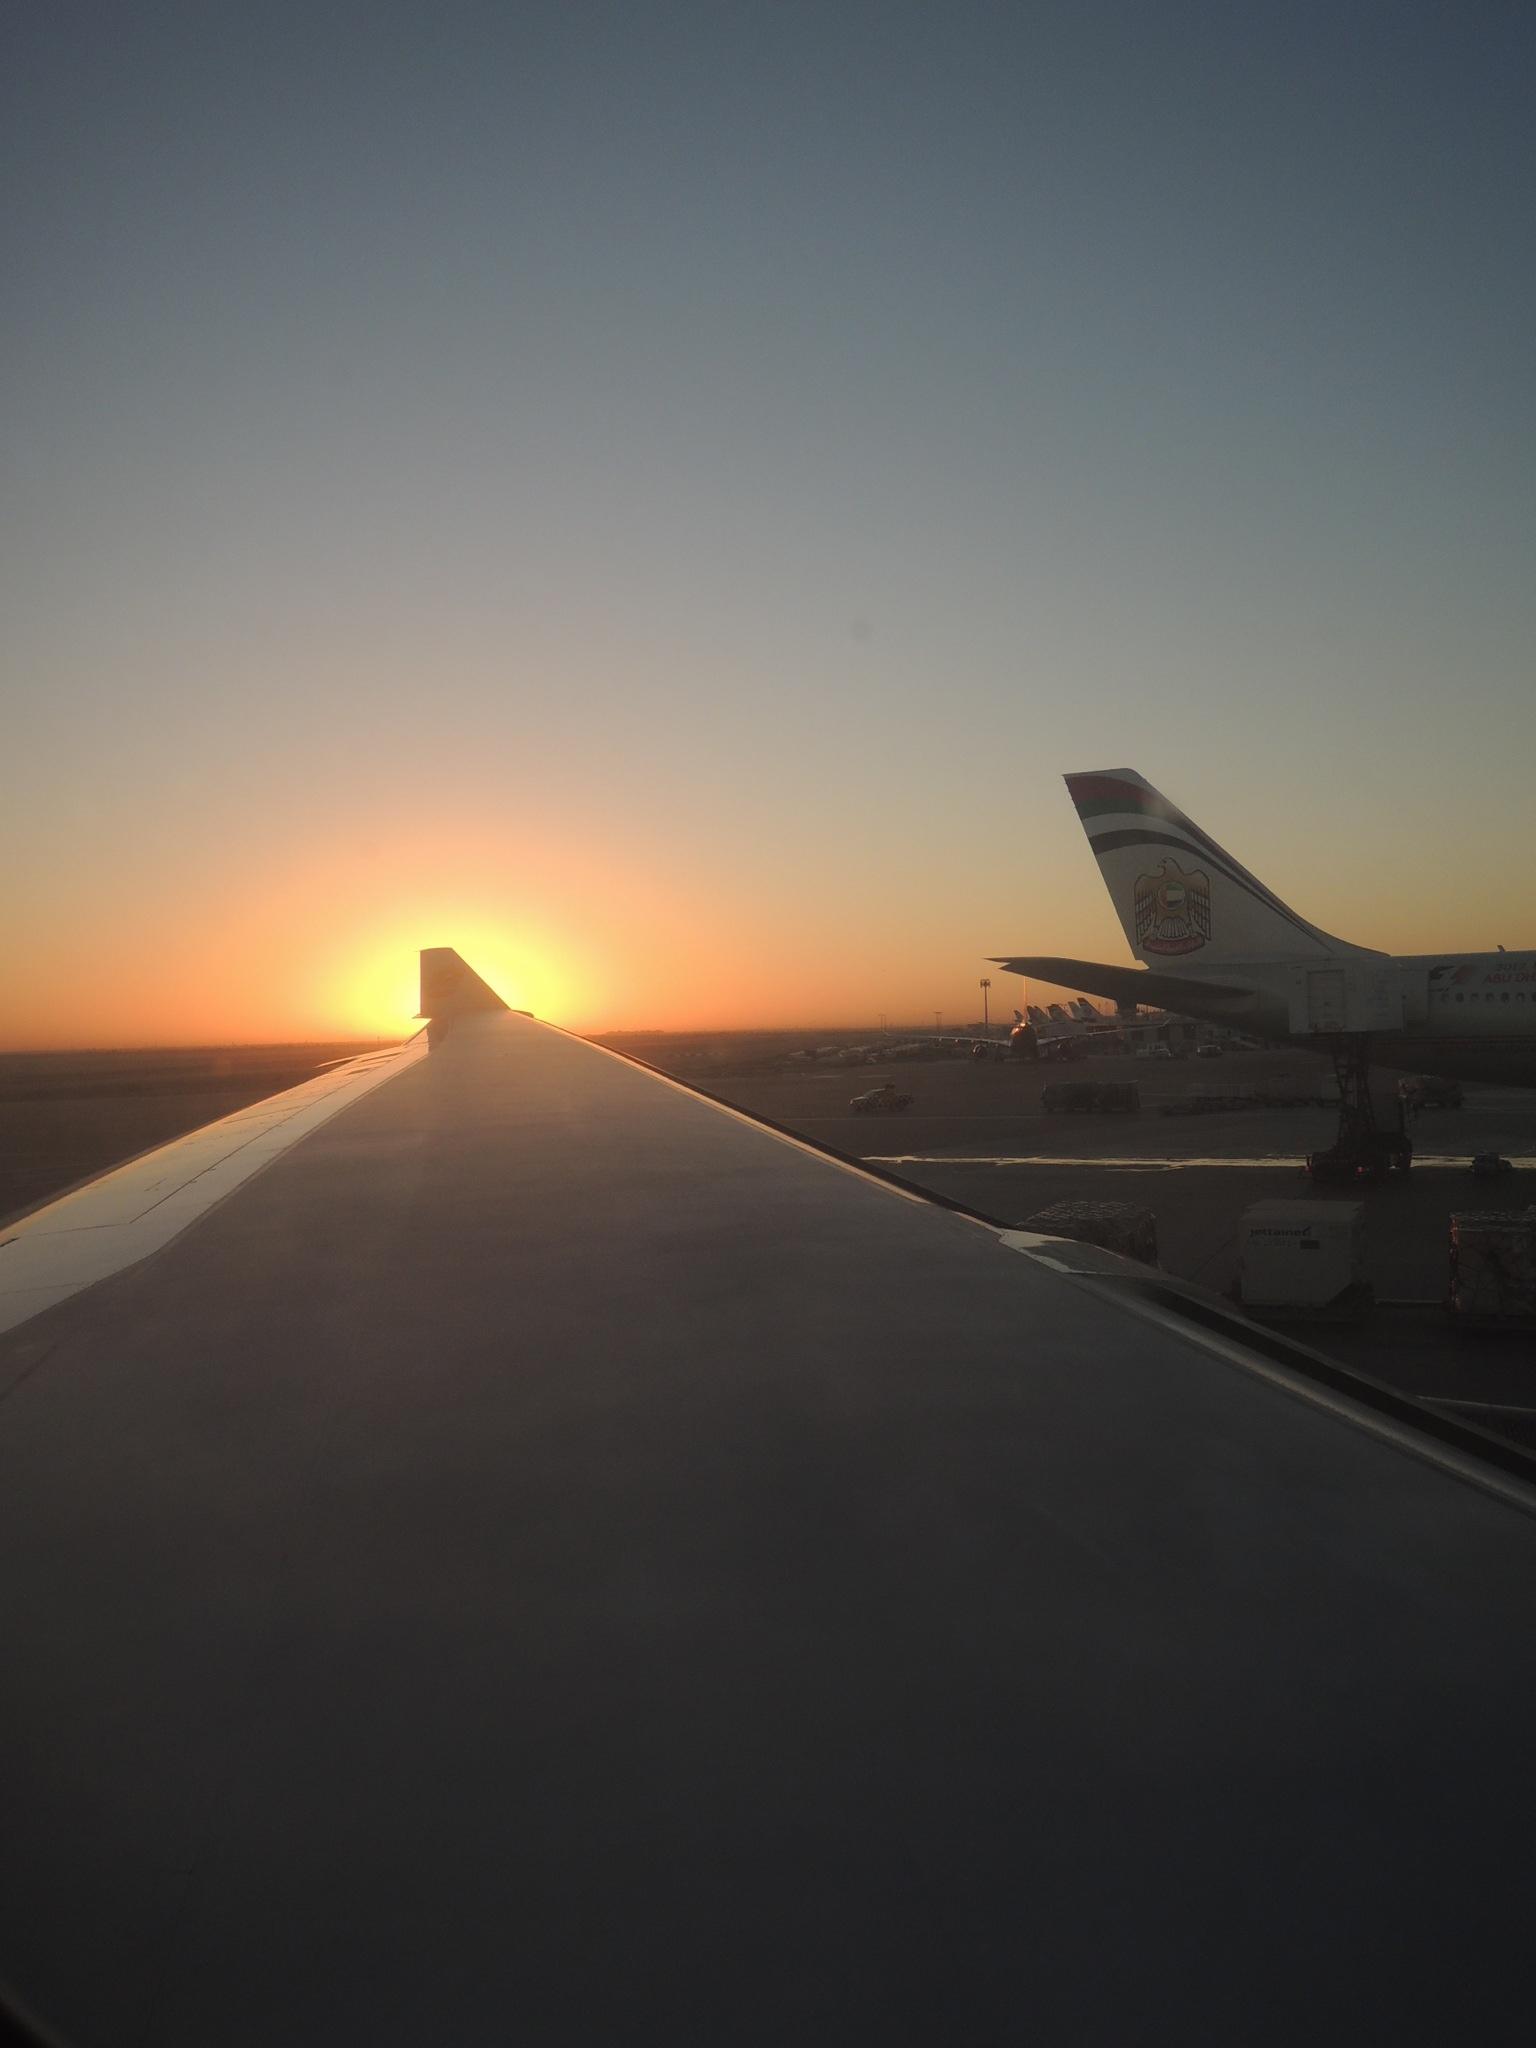 Sonnenaufgang vom Flugzeug